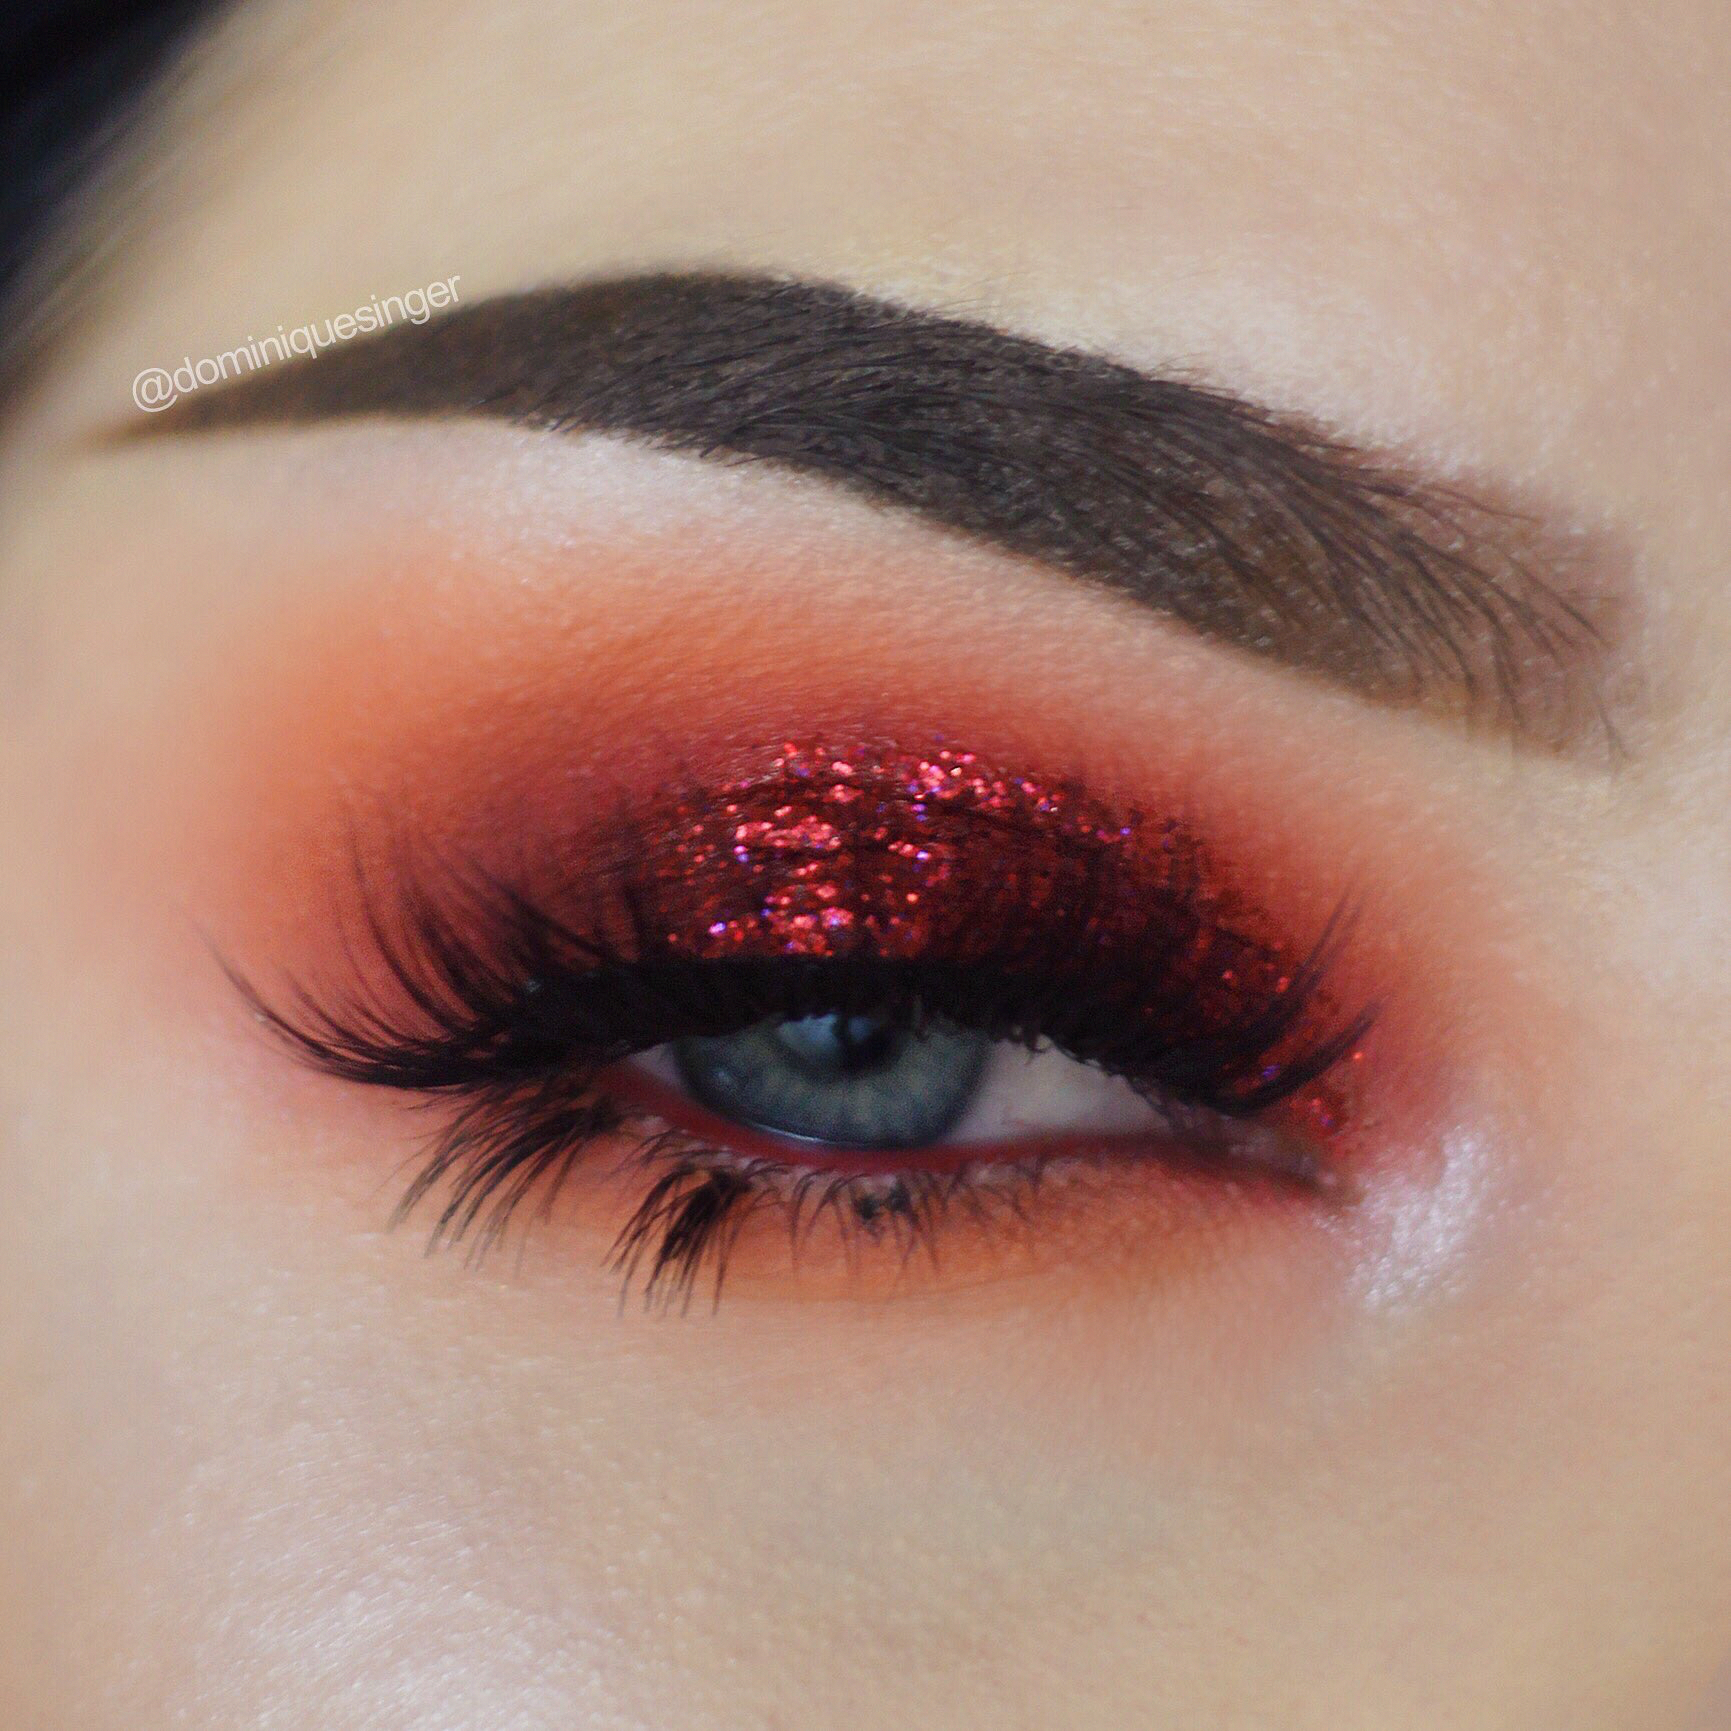 Red glitter eye makeup #cranberryeyemakeup Red glitter eye ...